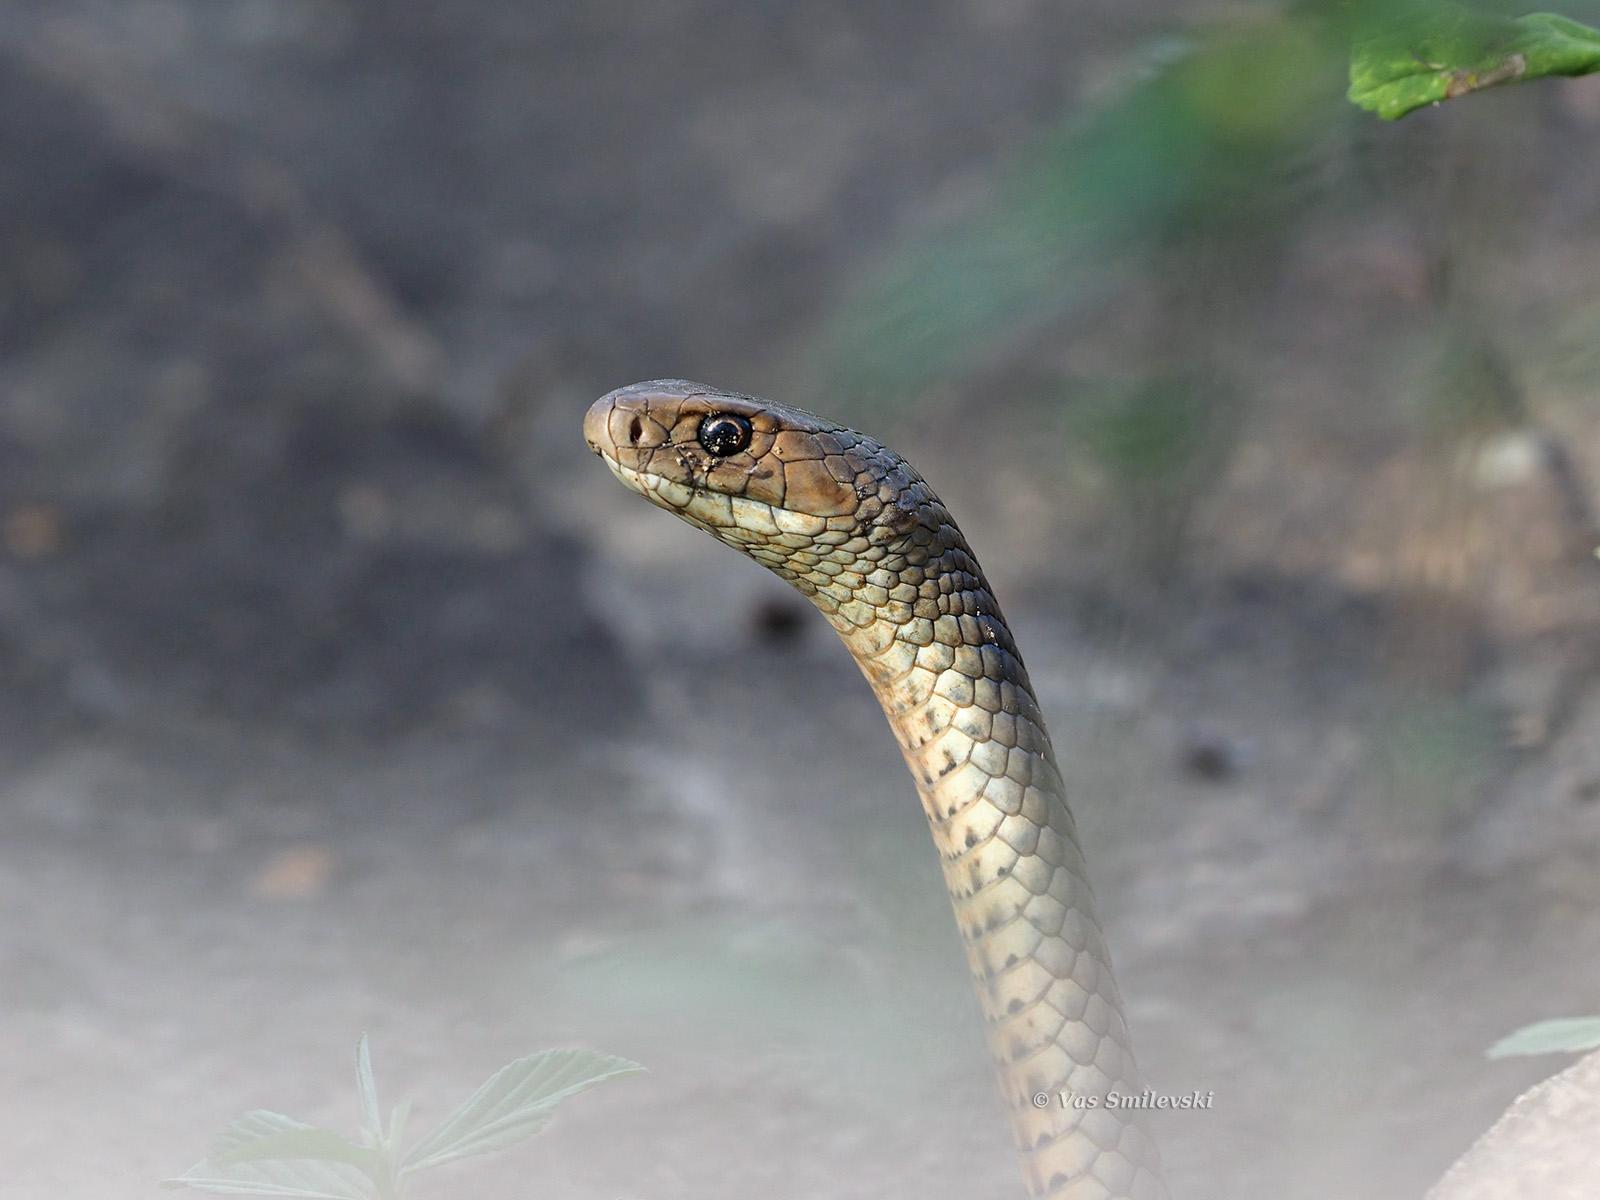 snakes birds in backyards